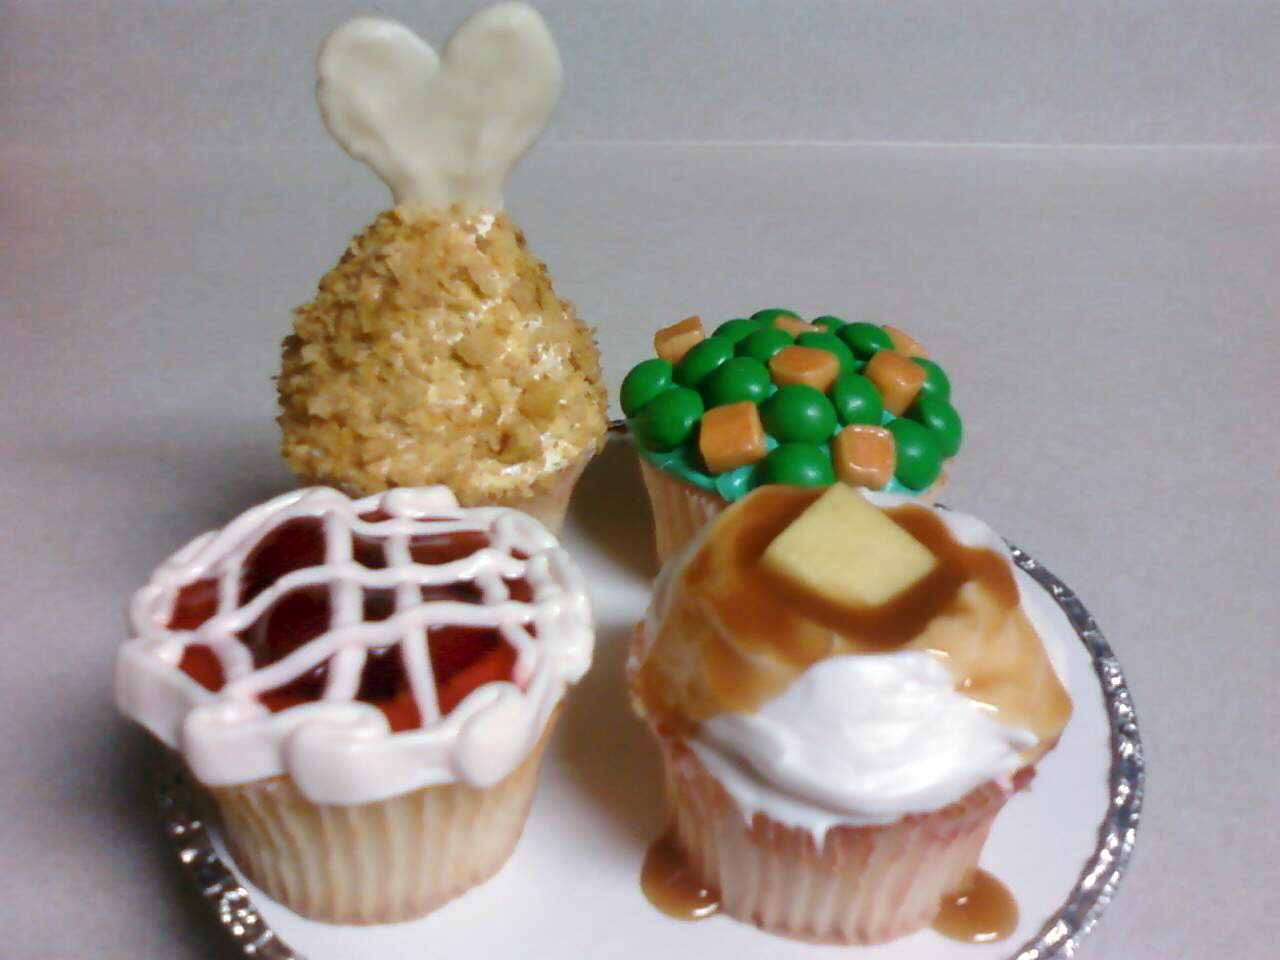 Grandma's Christmas Cupcakes AllrecipesPhoto